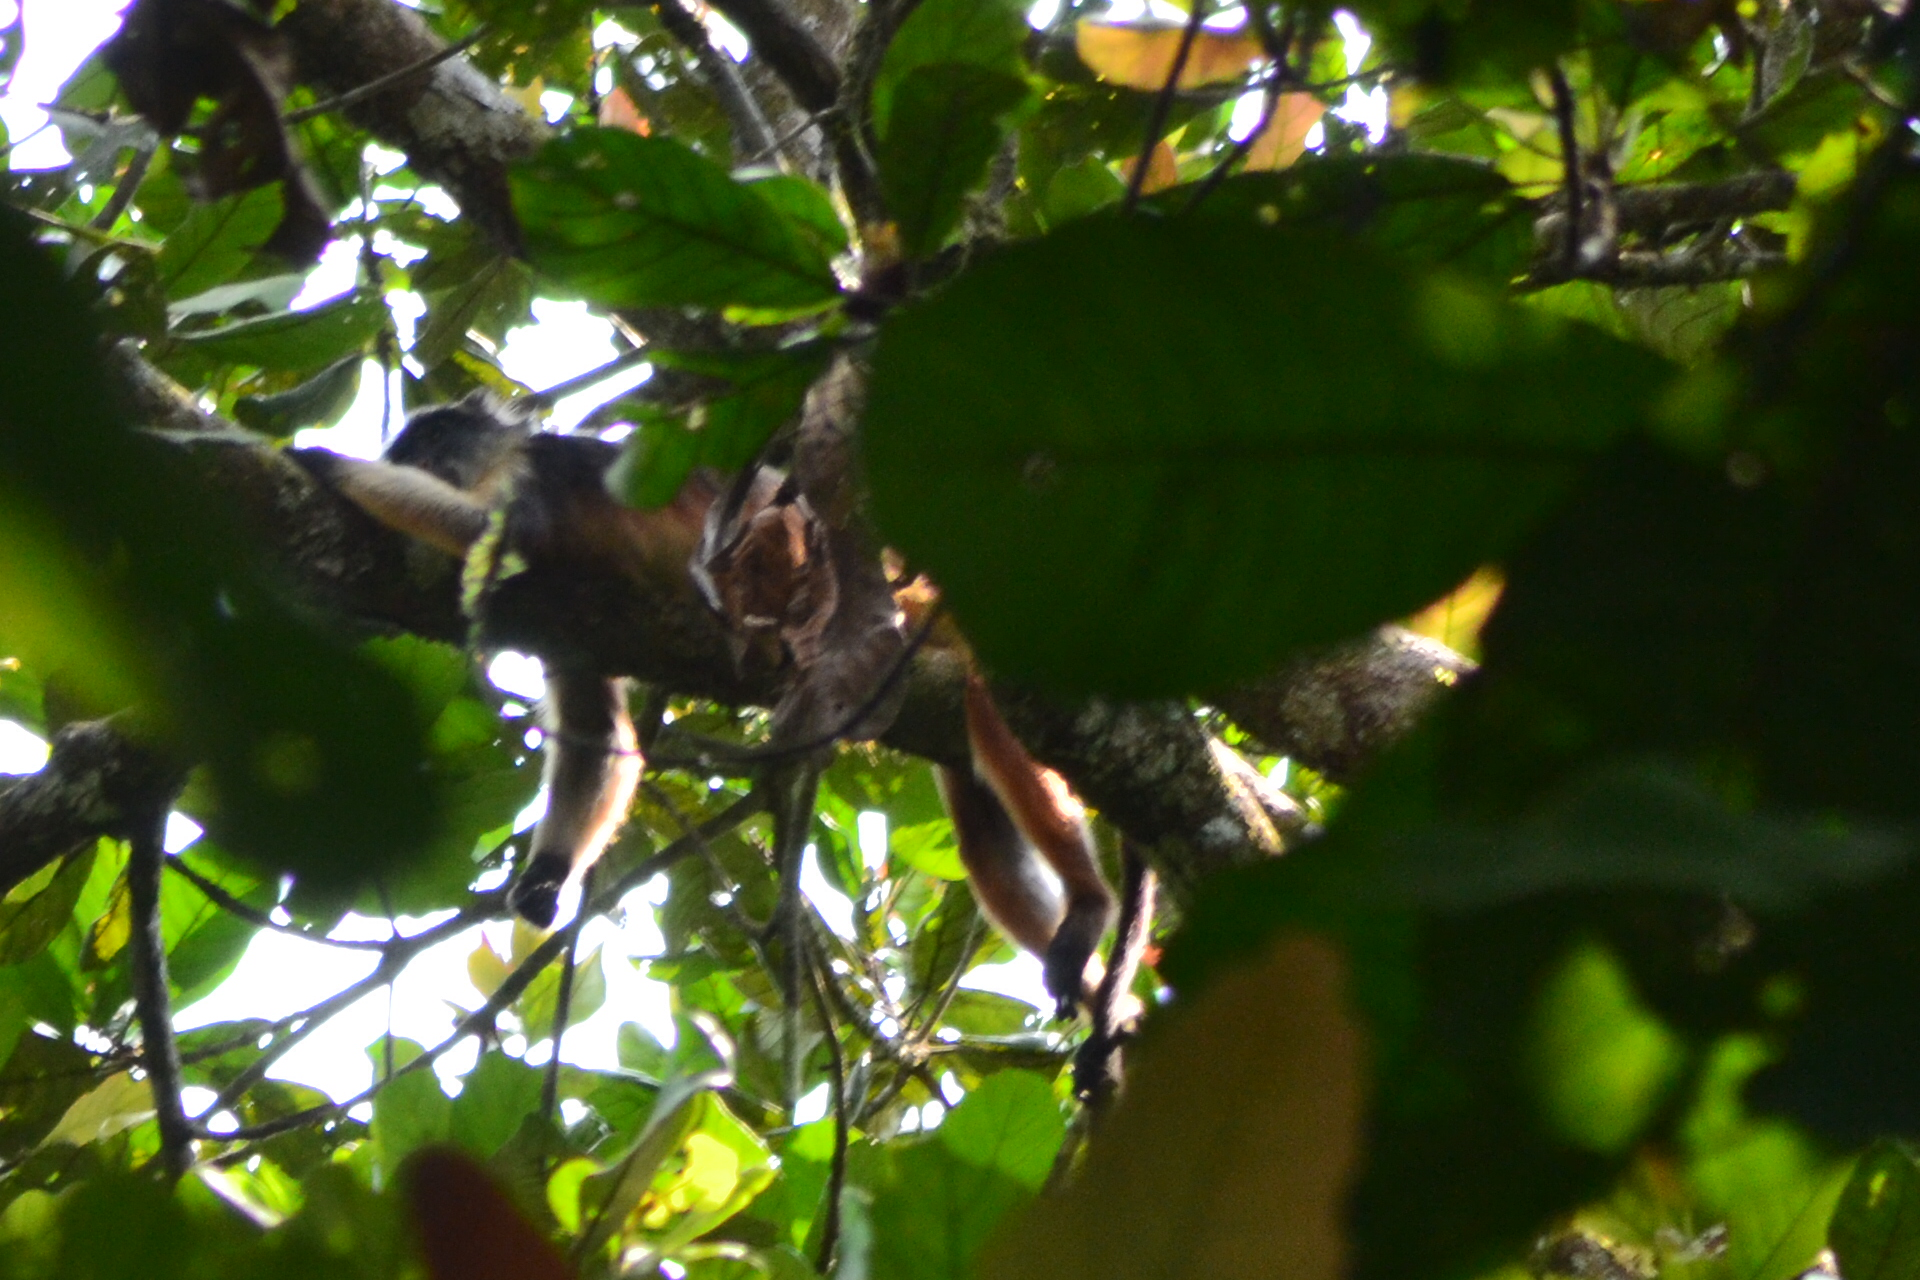 Niger Delta Red Colobus Monkey 3